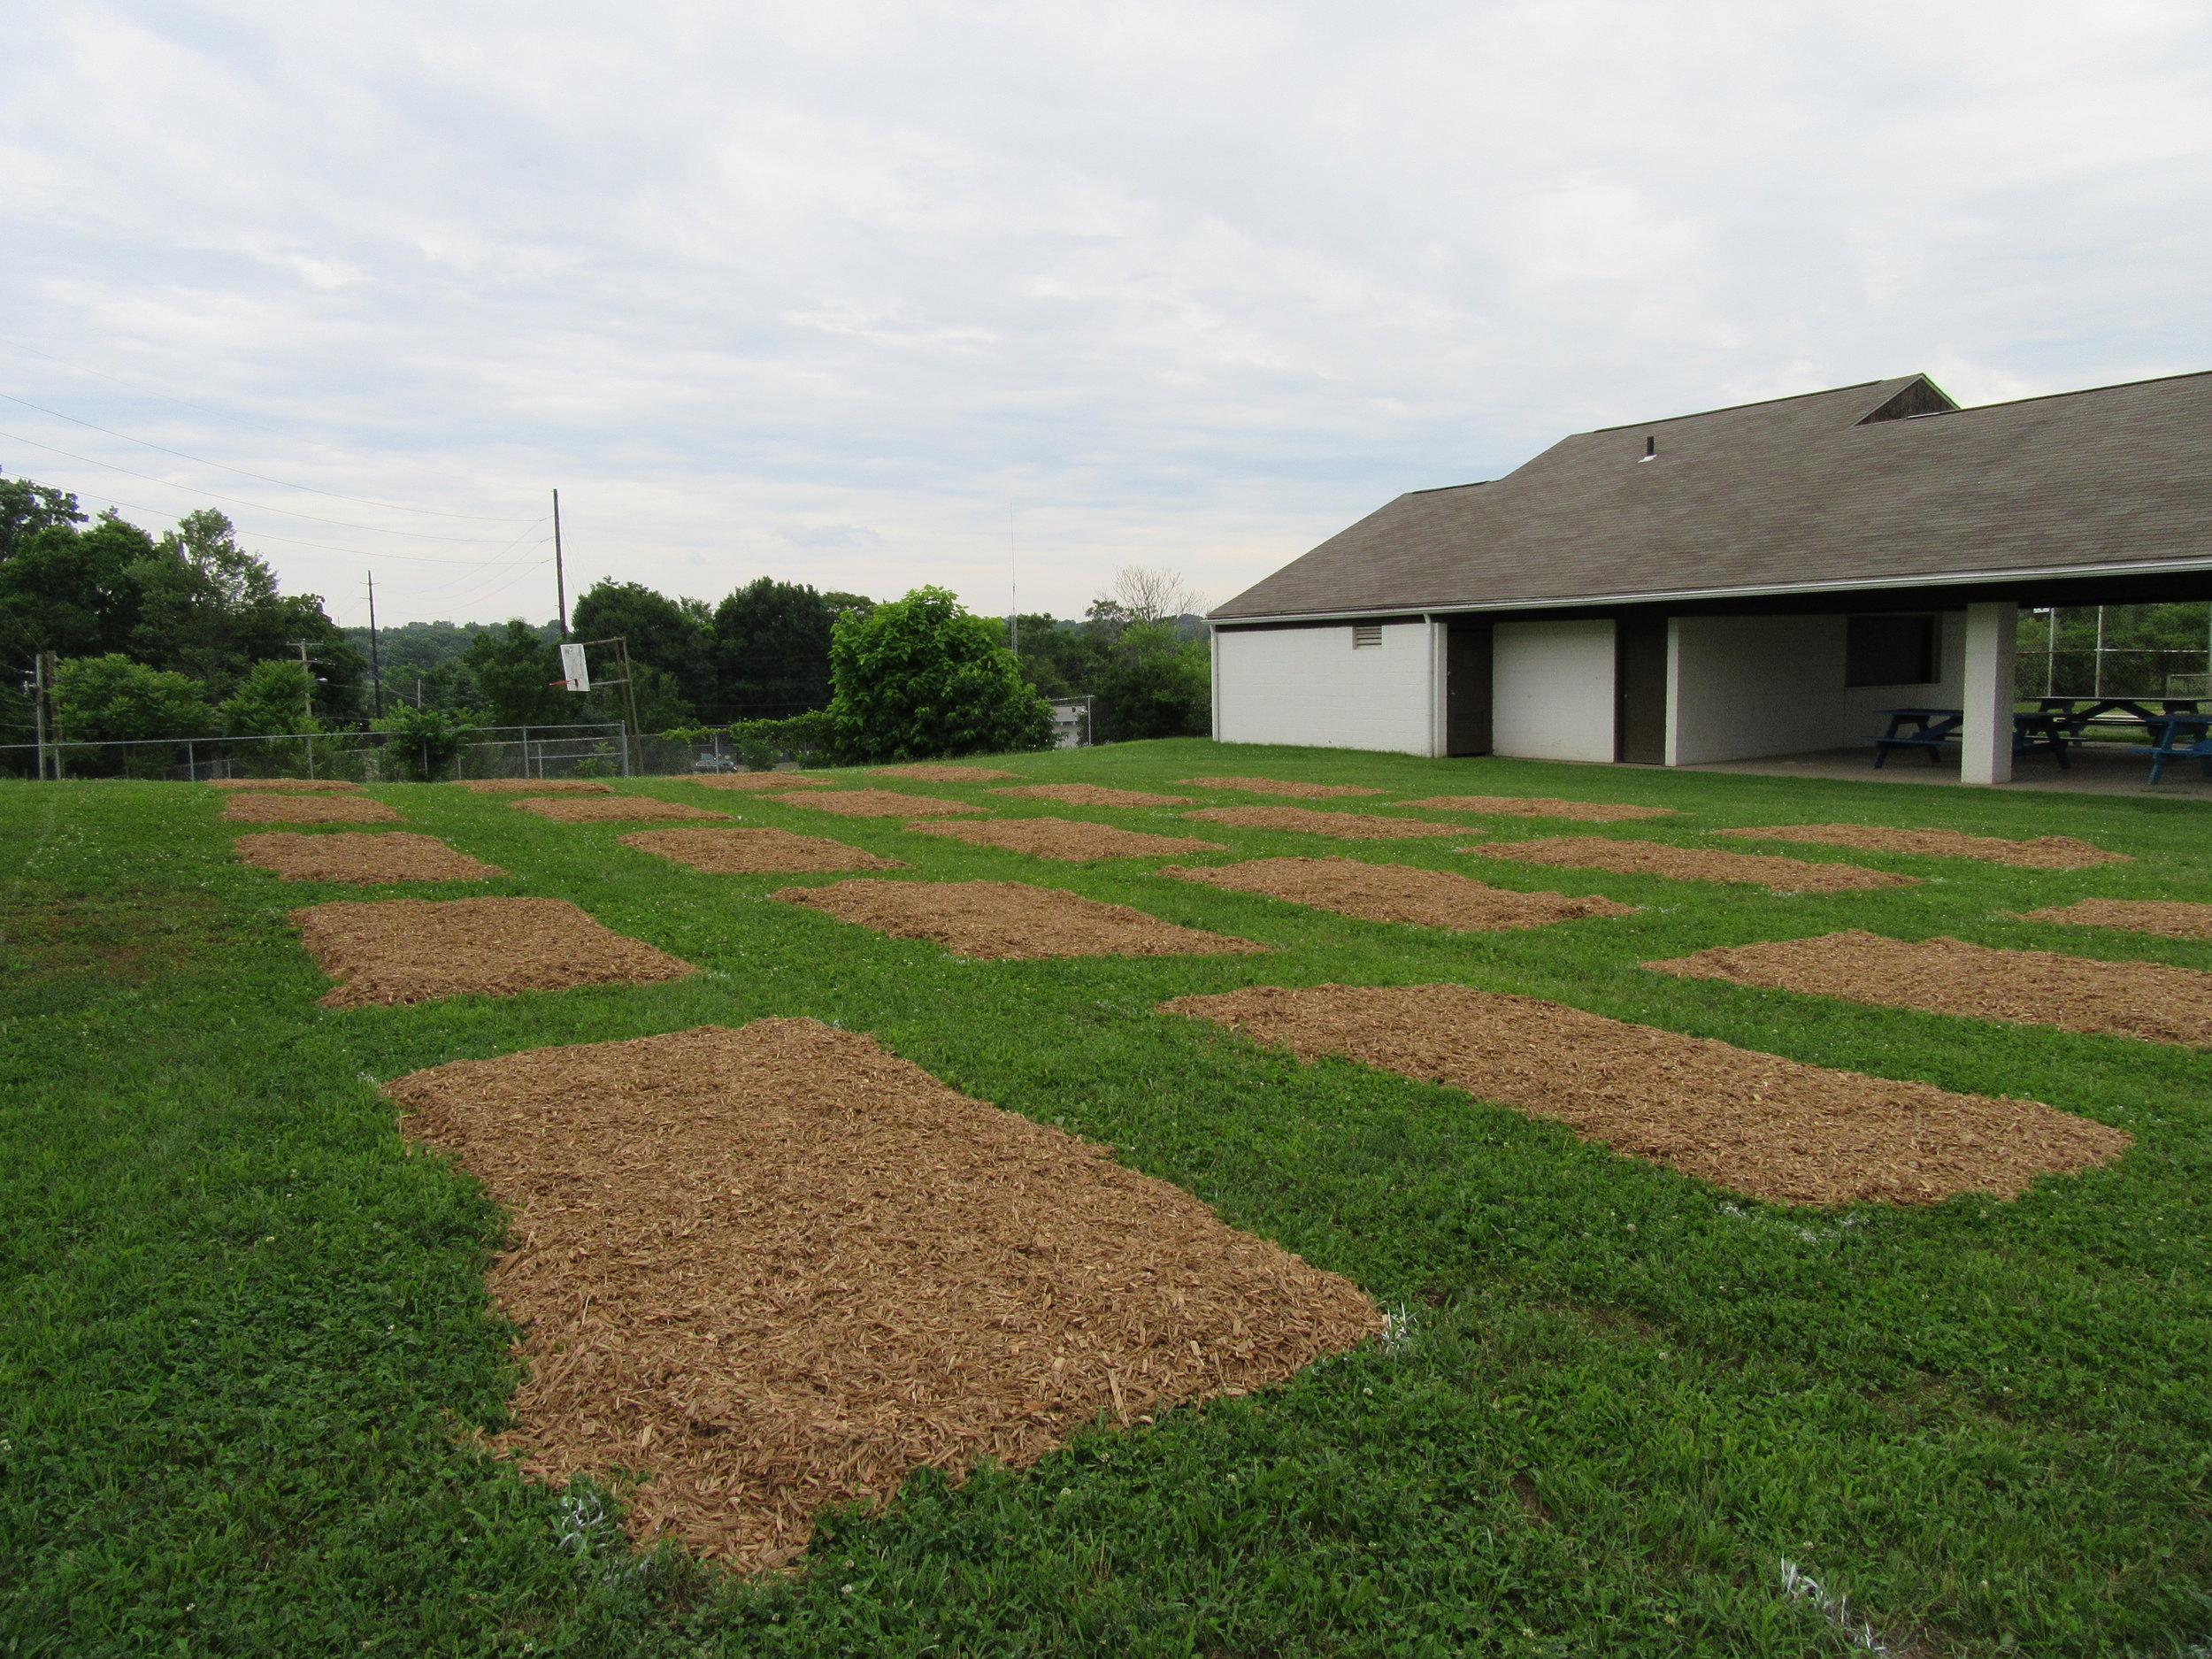 ROW 21 - Community Garden at Massillon Boys & Girls Club_3.JPG